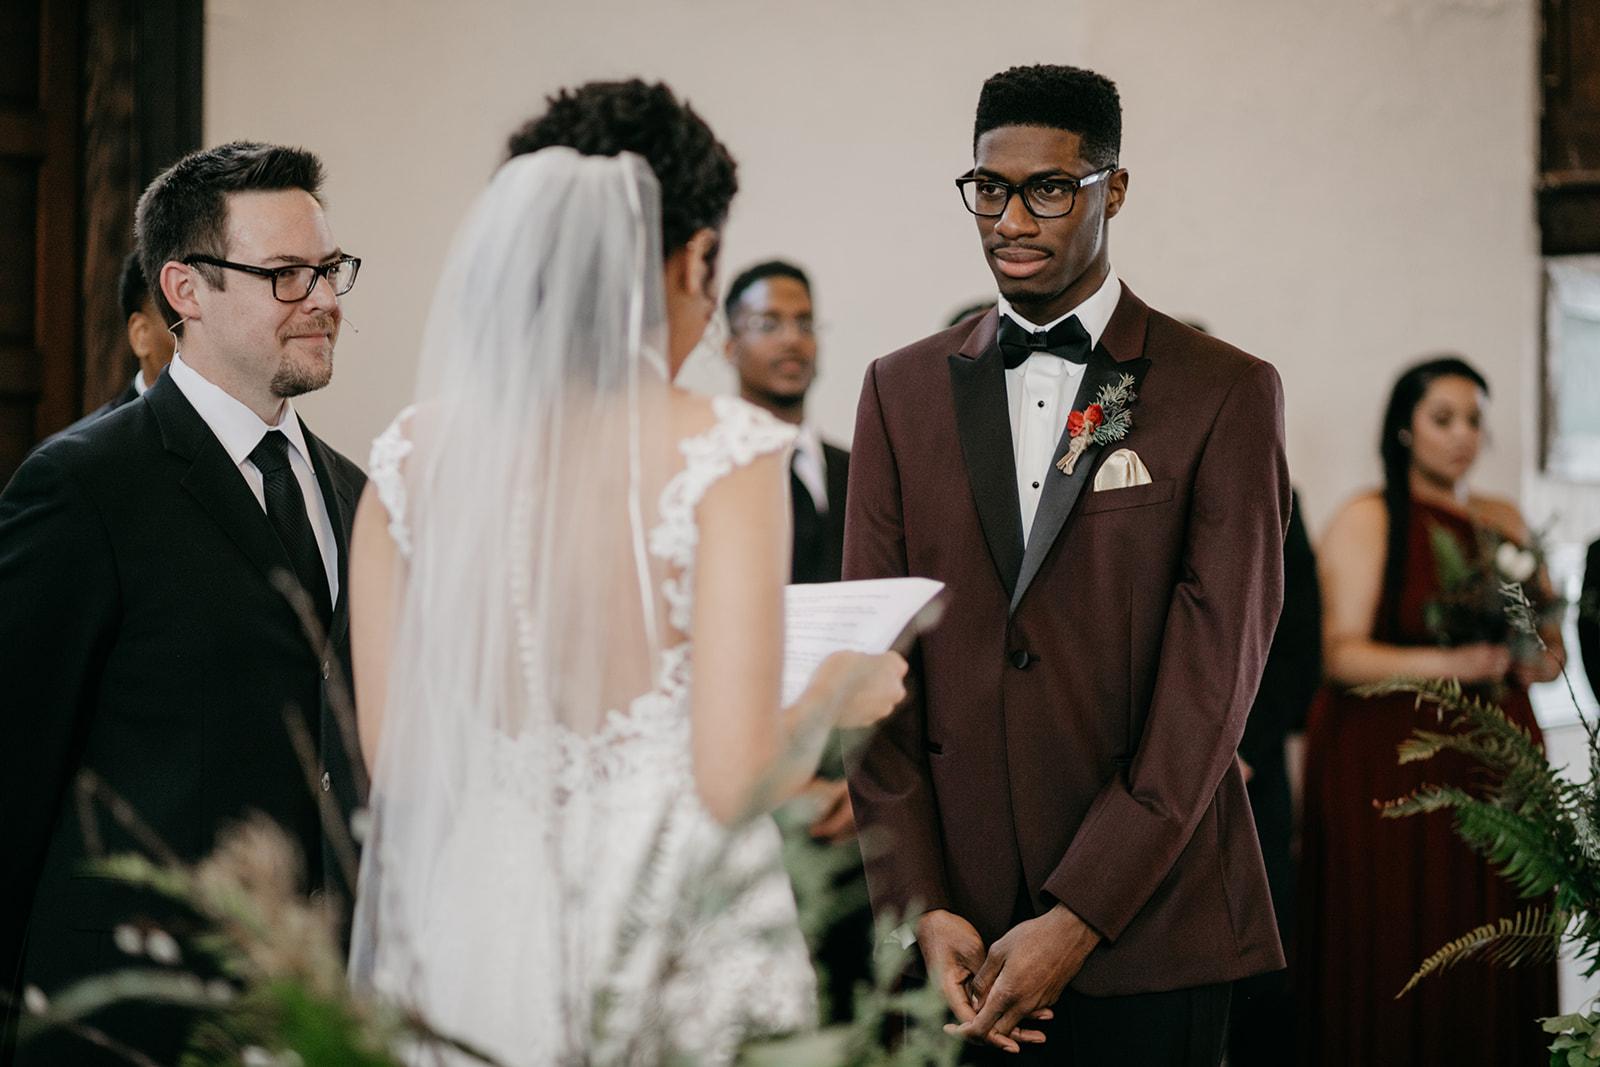 portland - wedding - photographer - doorofhopechurch478.jpg